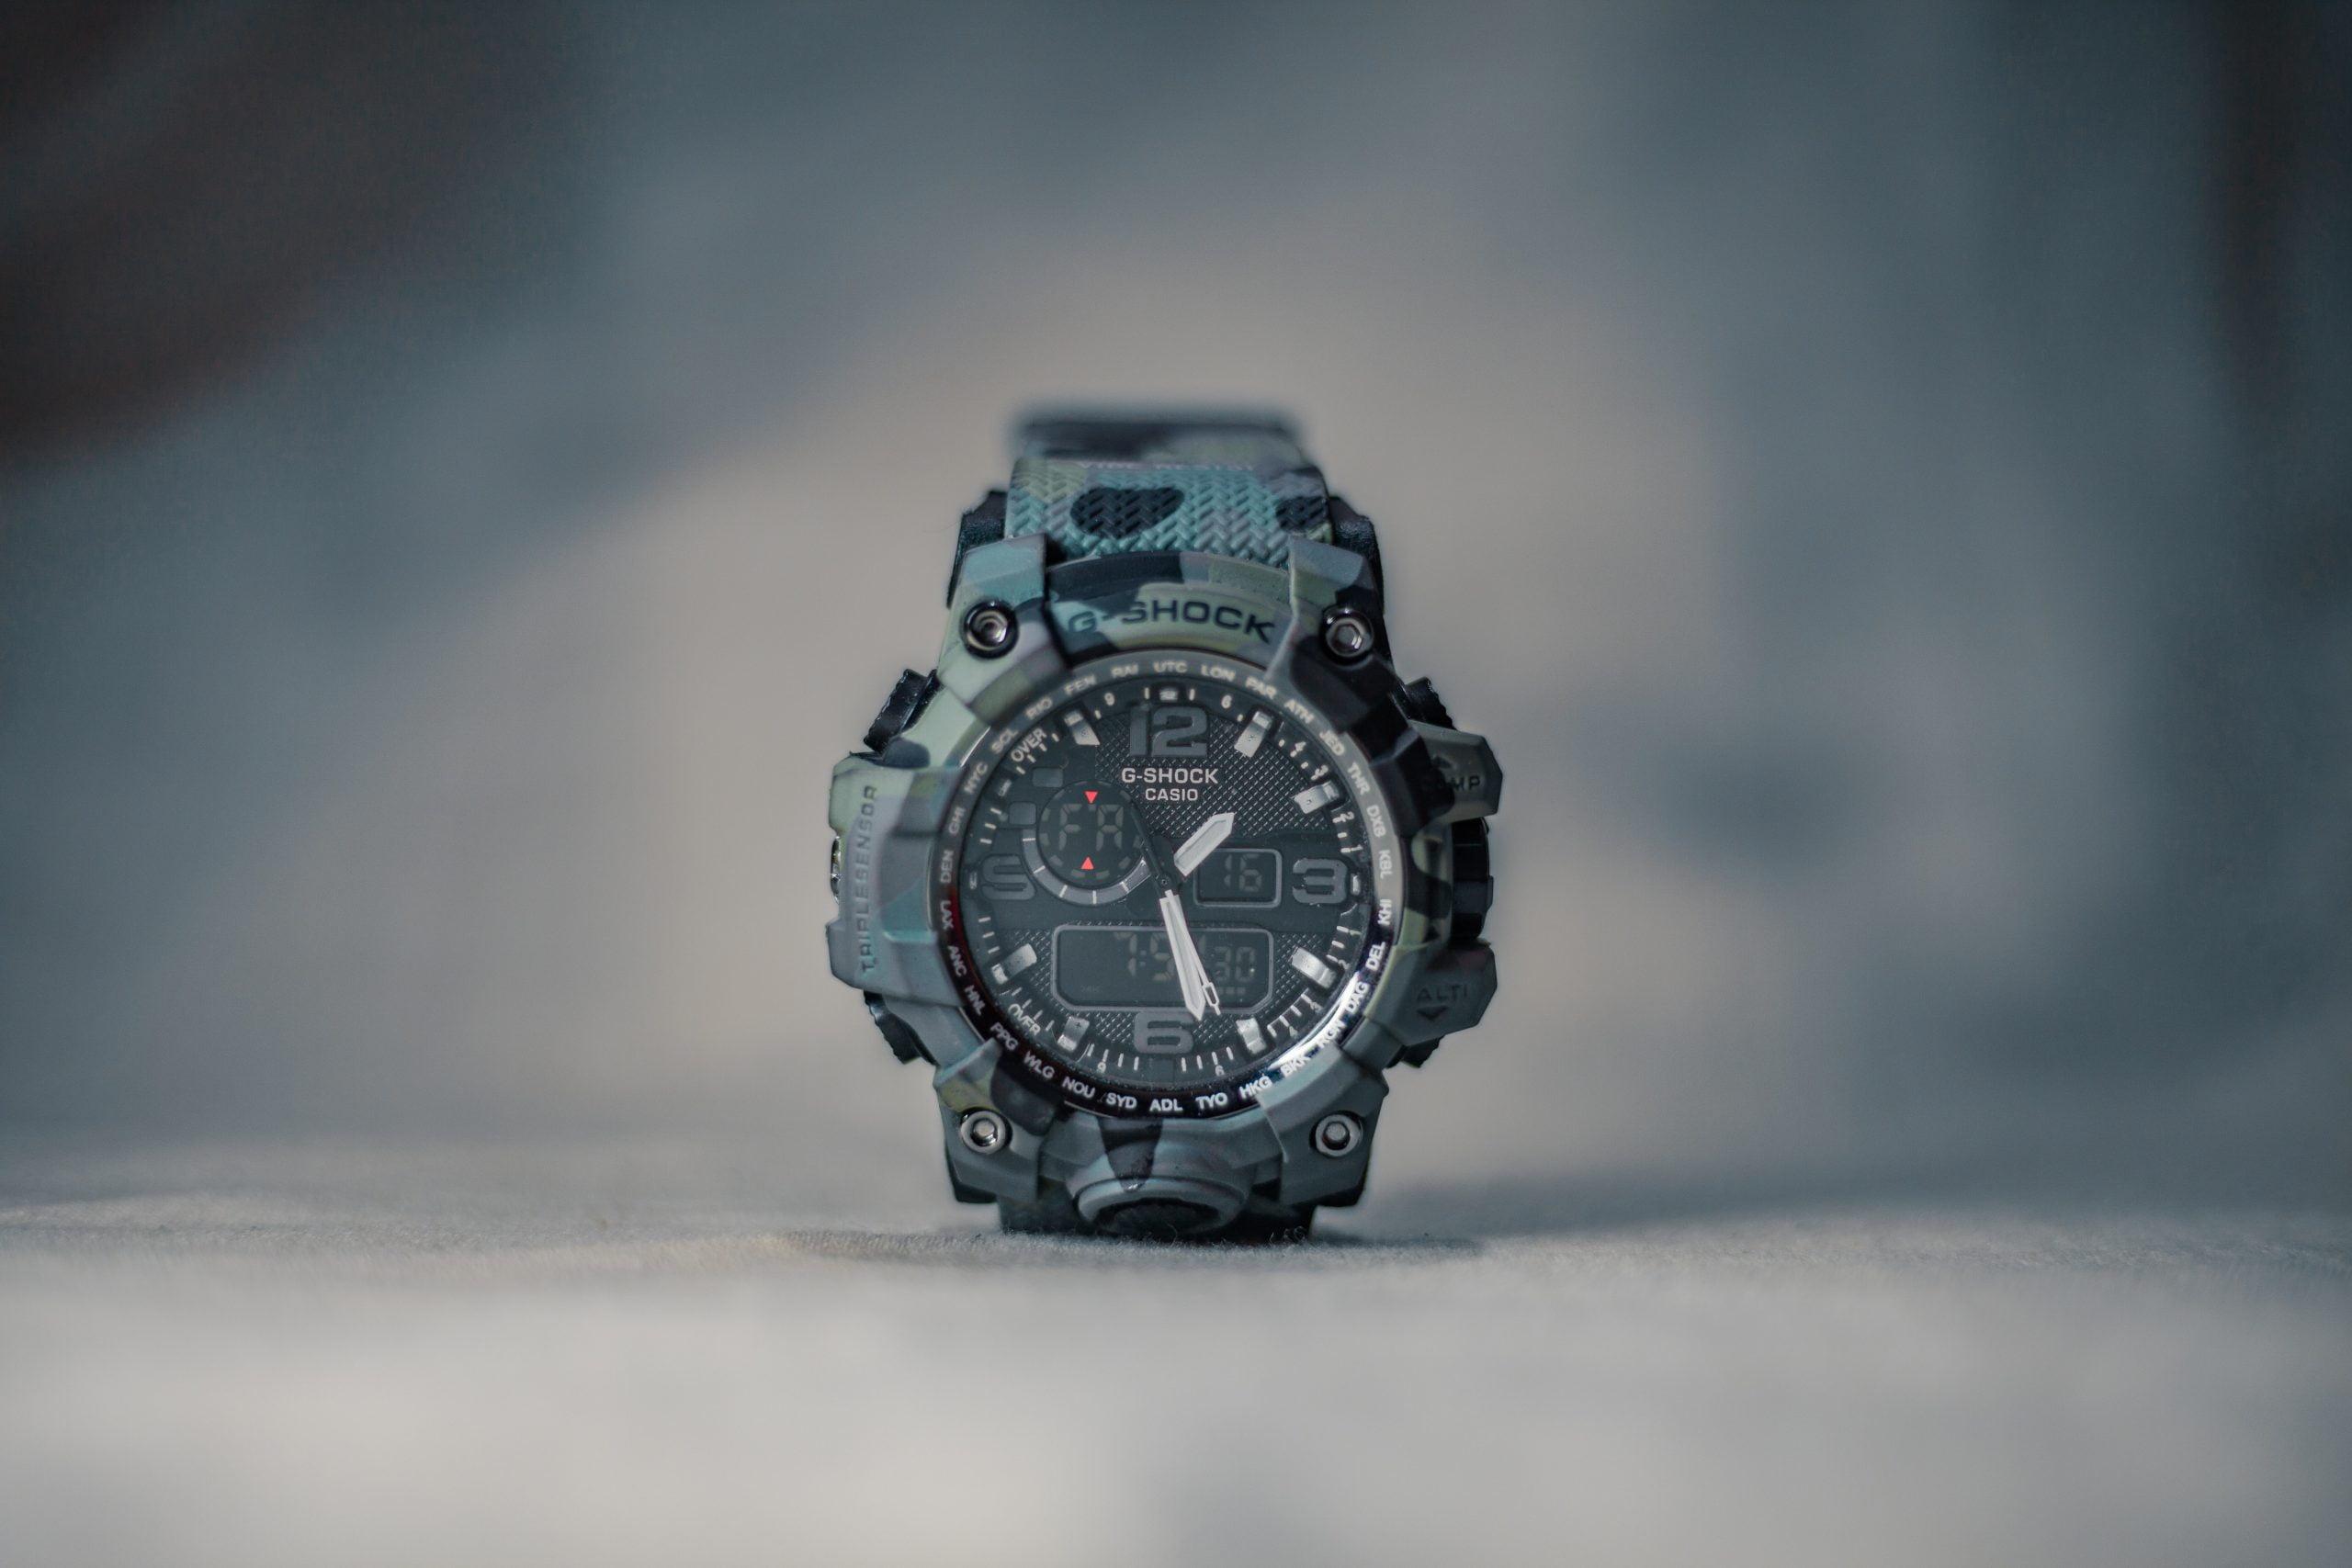 Zegarek G Shock GA 100 – jak ustawić wskazówki?